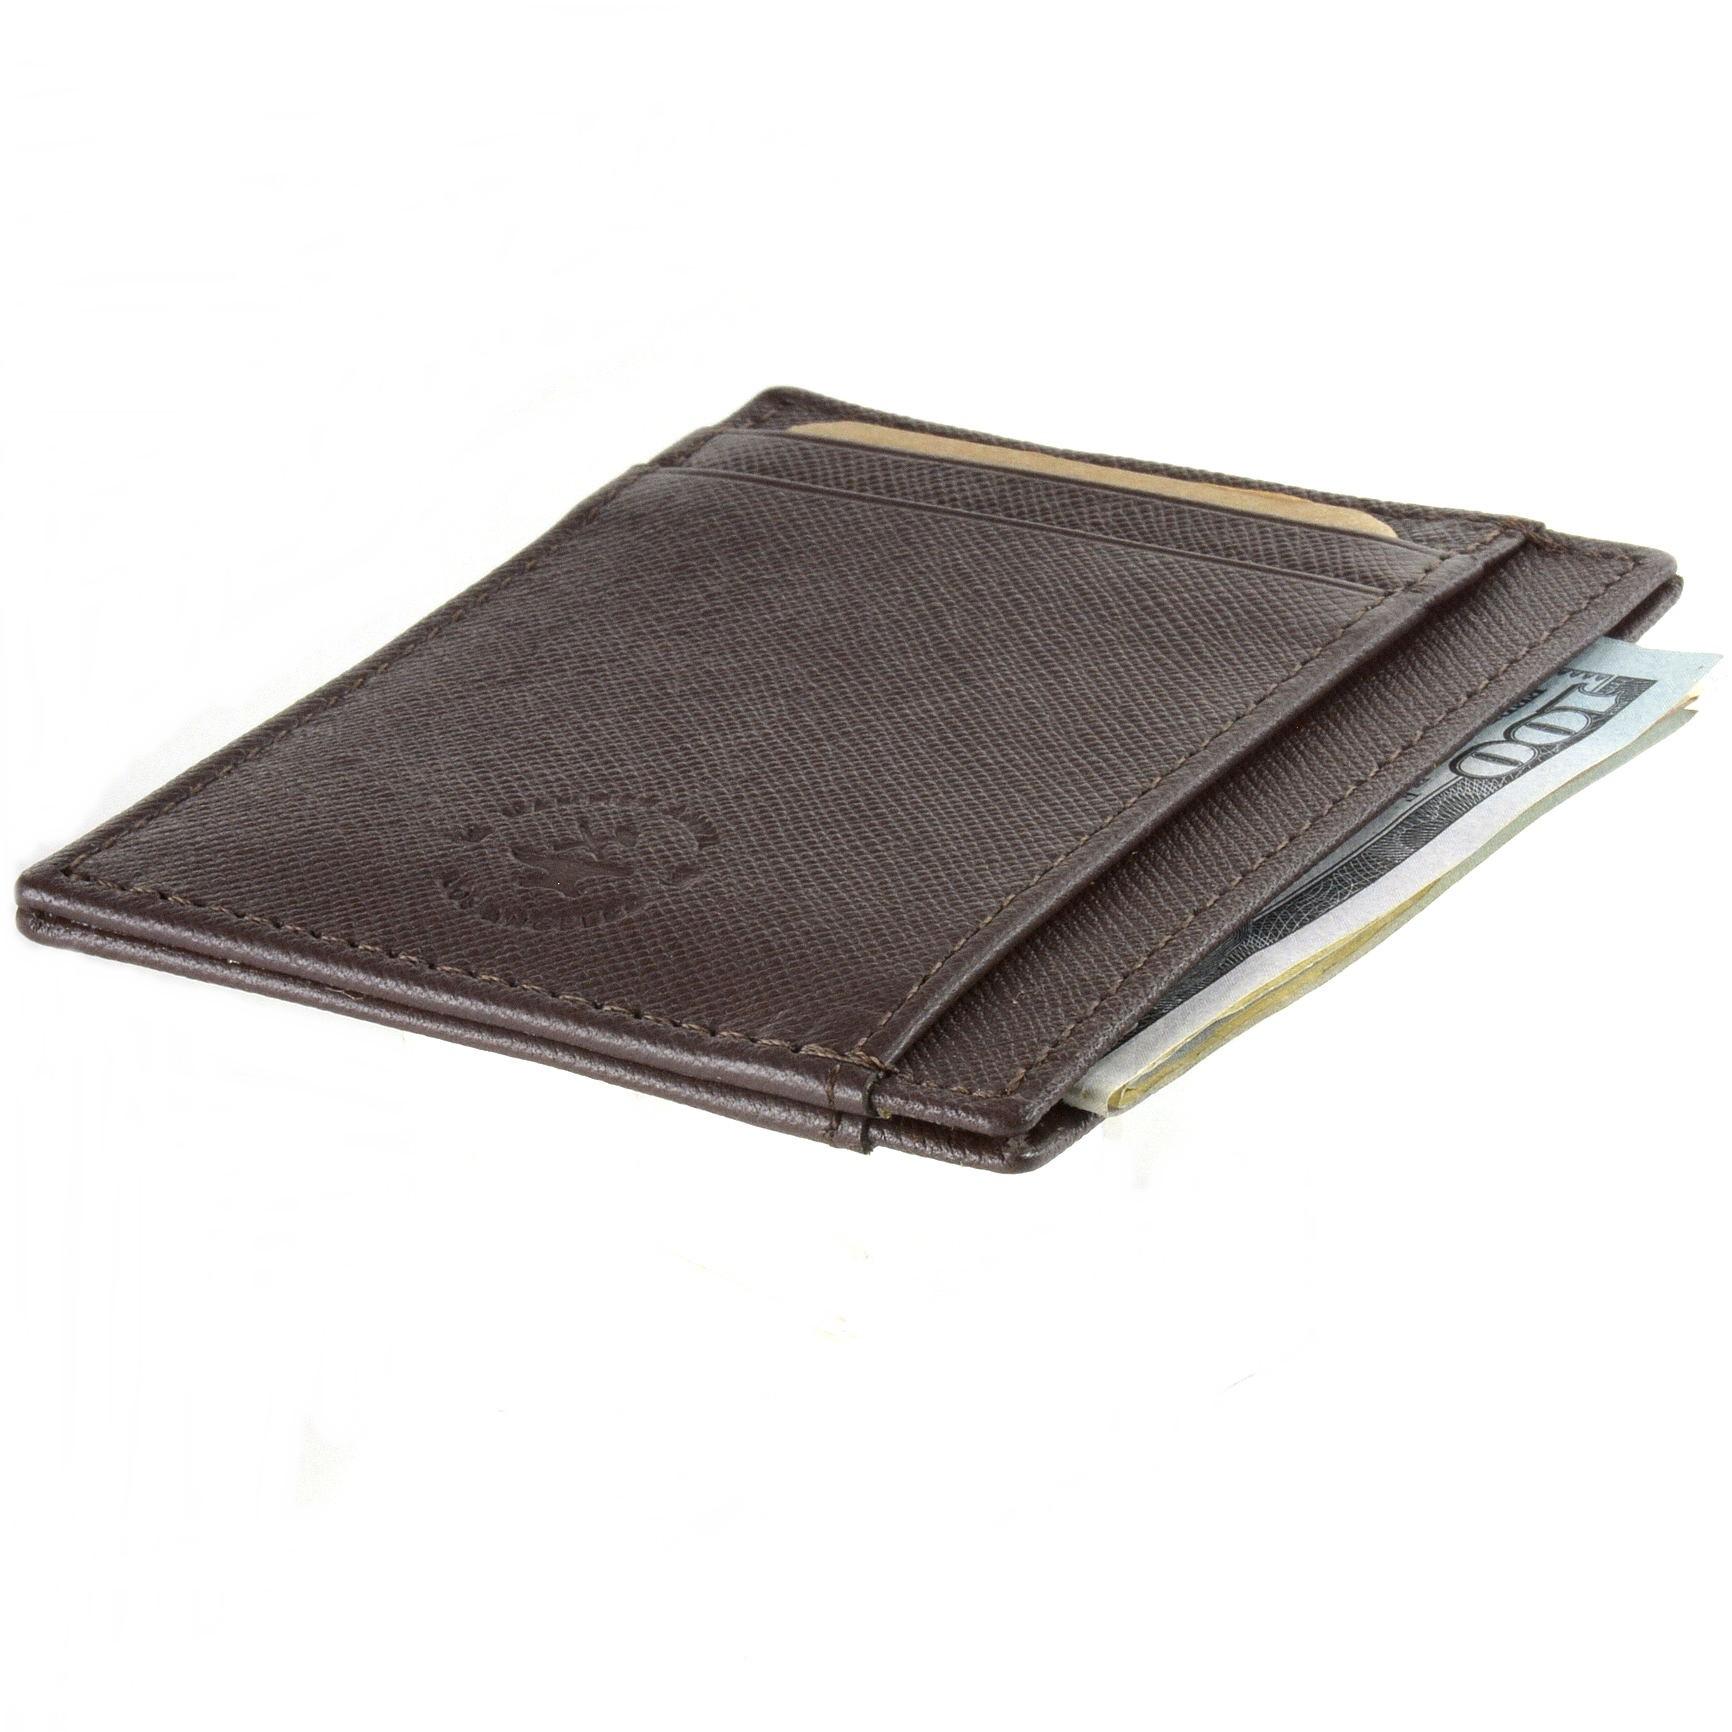 miniature 43 - Hammer-Anvil-Minimalist-Front-Pocket-Wallet-RFID-Blocking-Thin-Leather-Card-Case